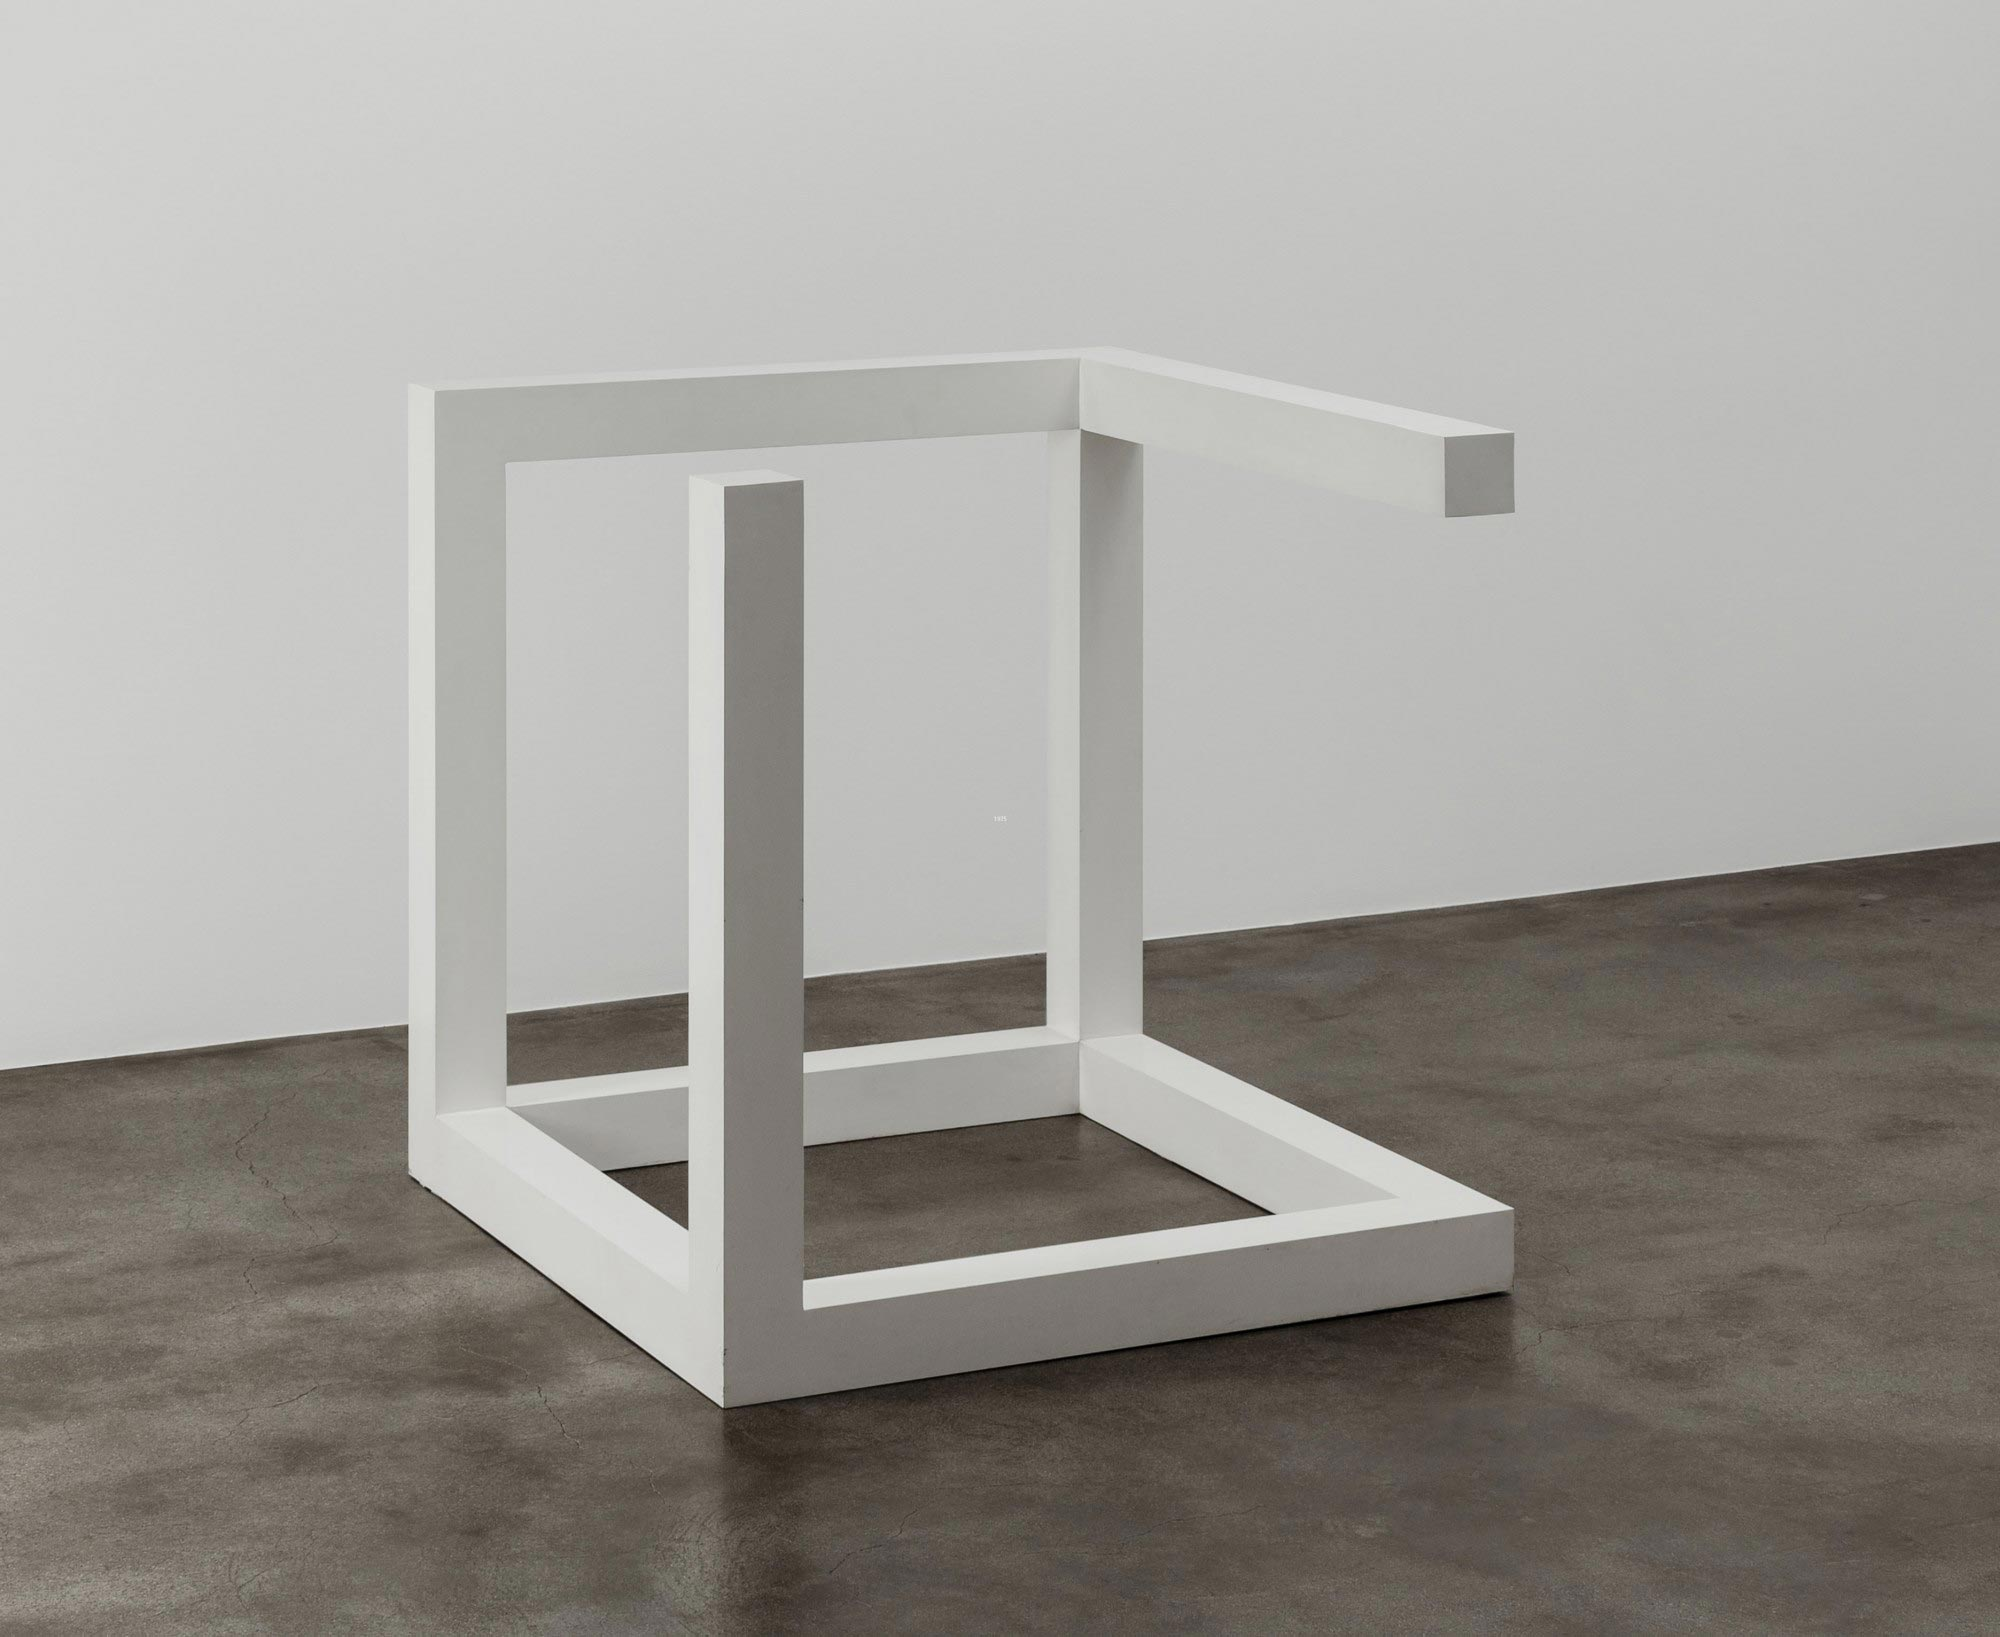 le-witt-incomplete-open-cubes-09